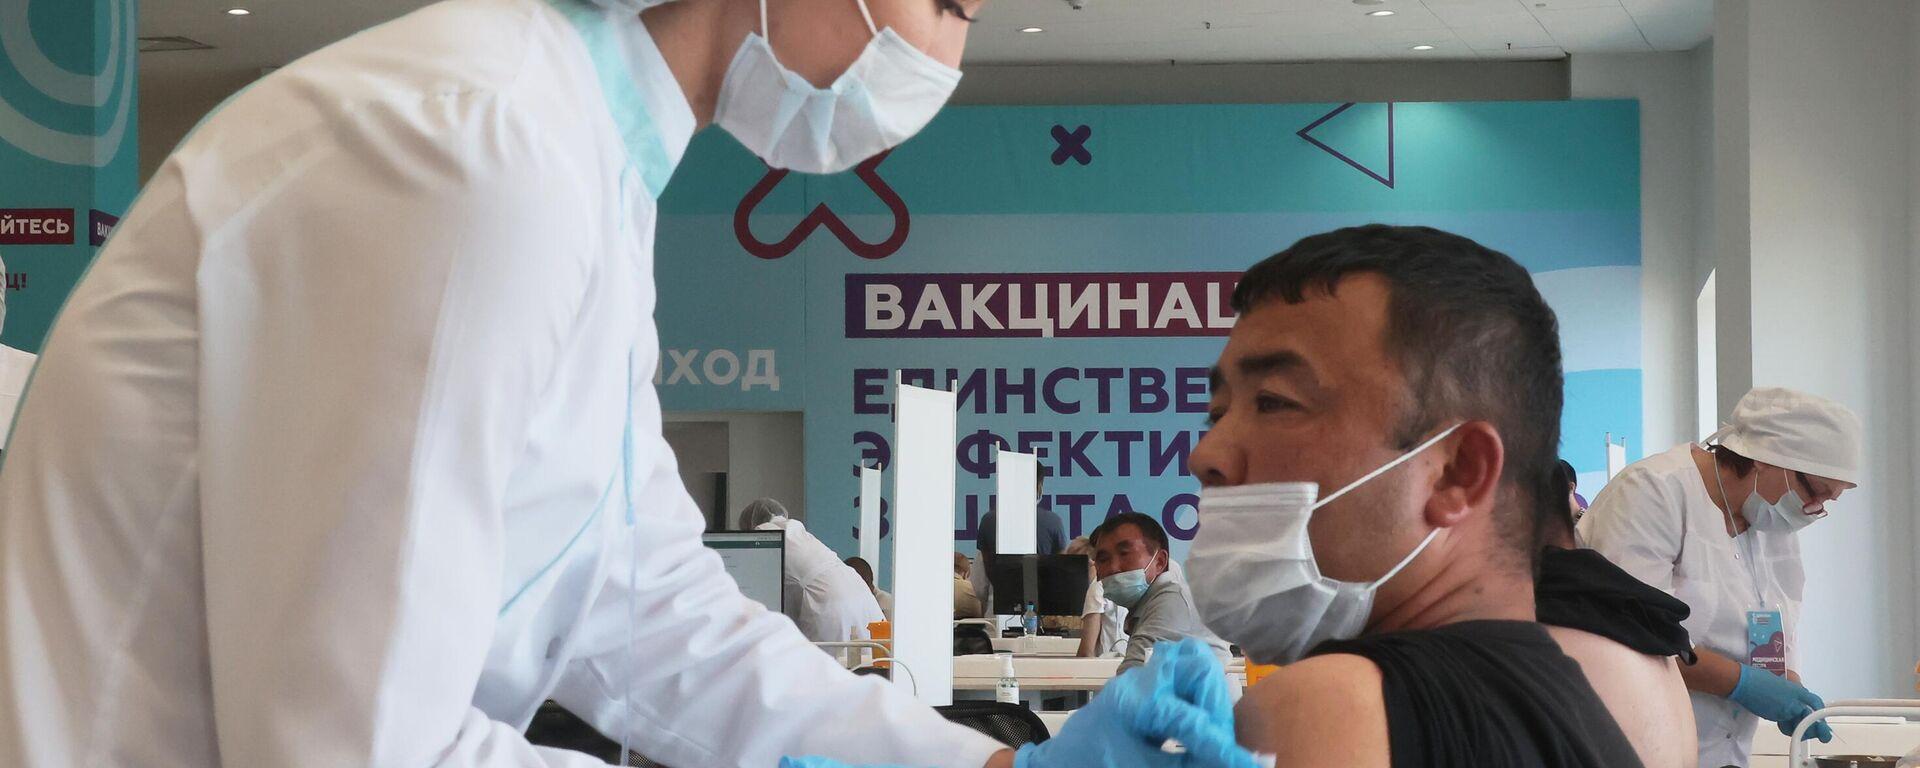 Центр вакцинации от COVID-19 в Лужниках - Sputnik Таджикистан, 1920, 13.08.2021